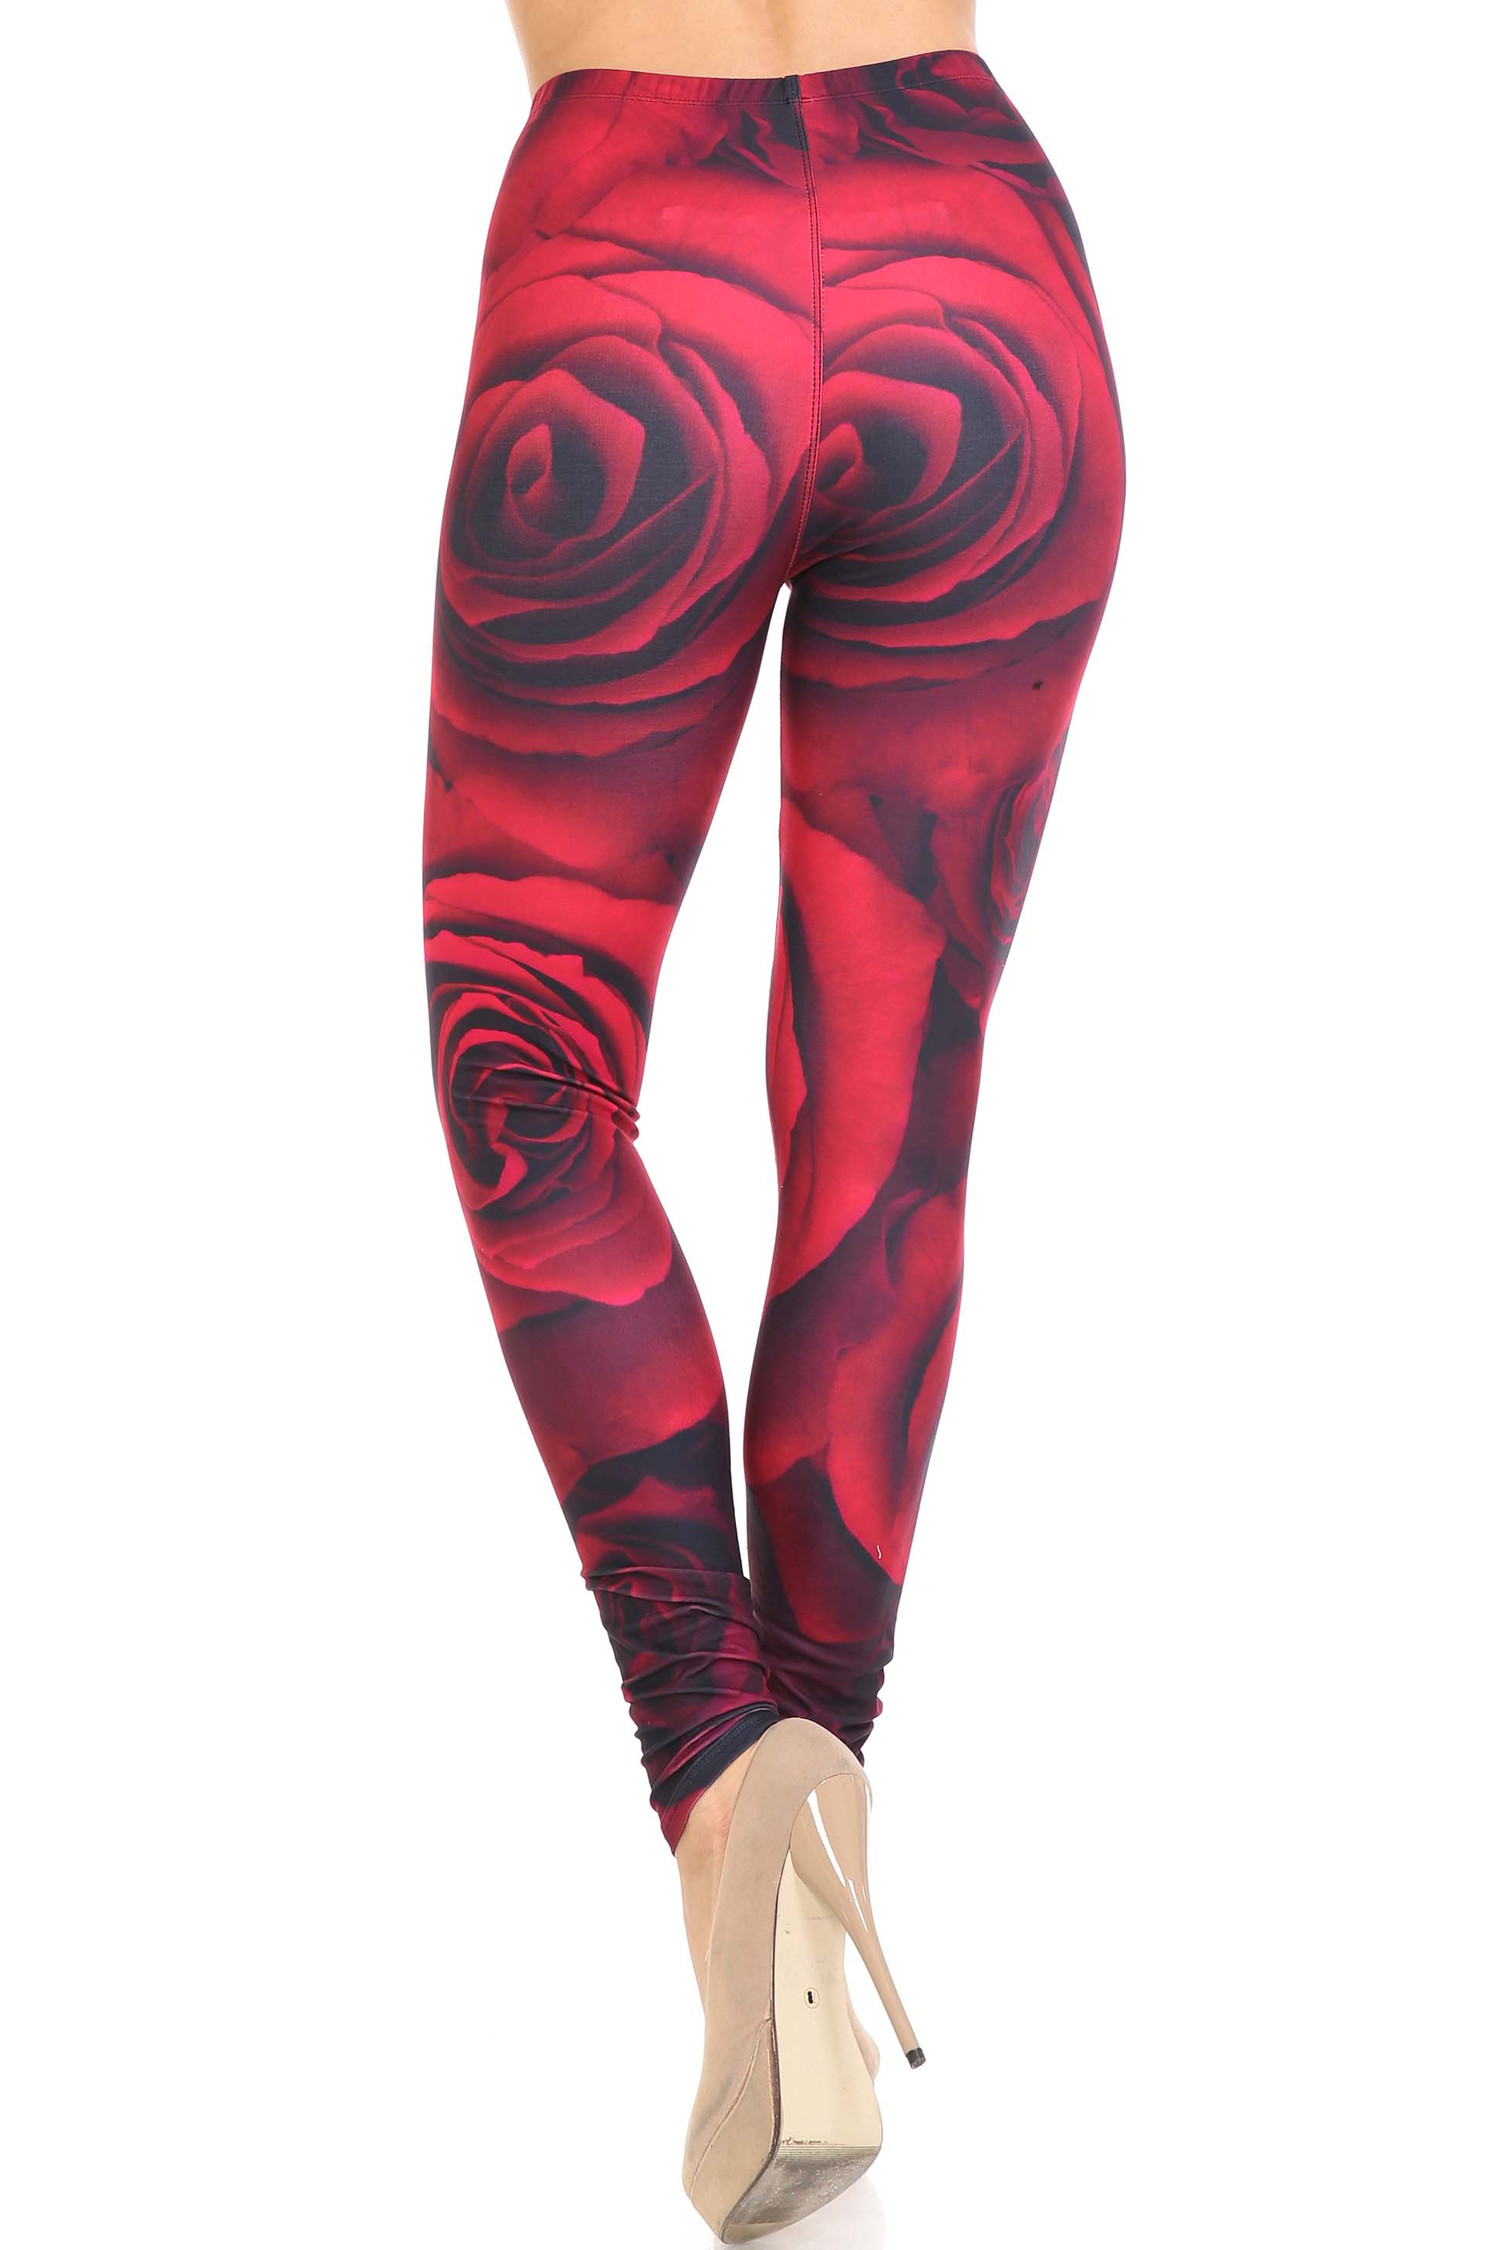 Creamy Soft Jumbo Red Rose Leggings - USA Fashion™